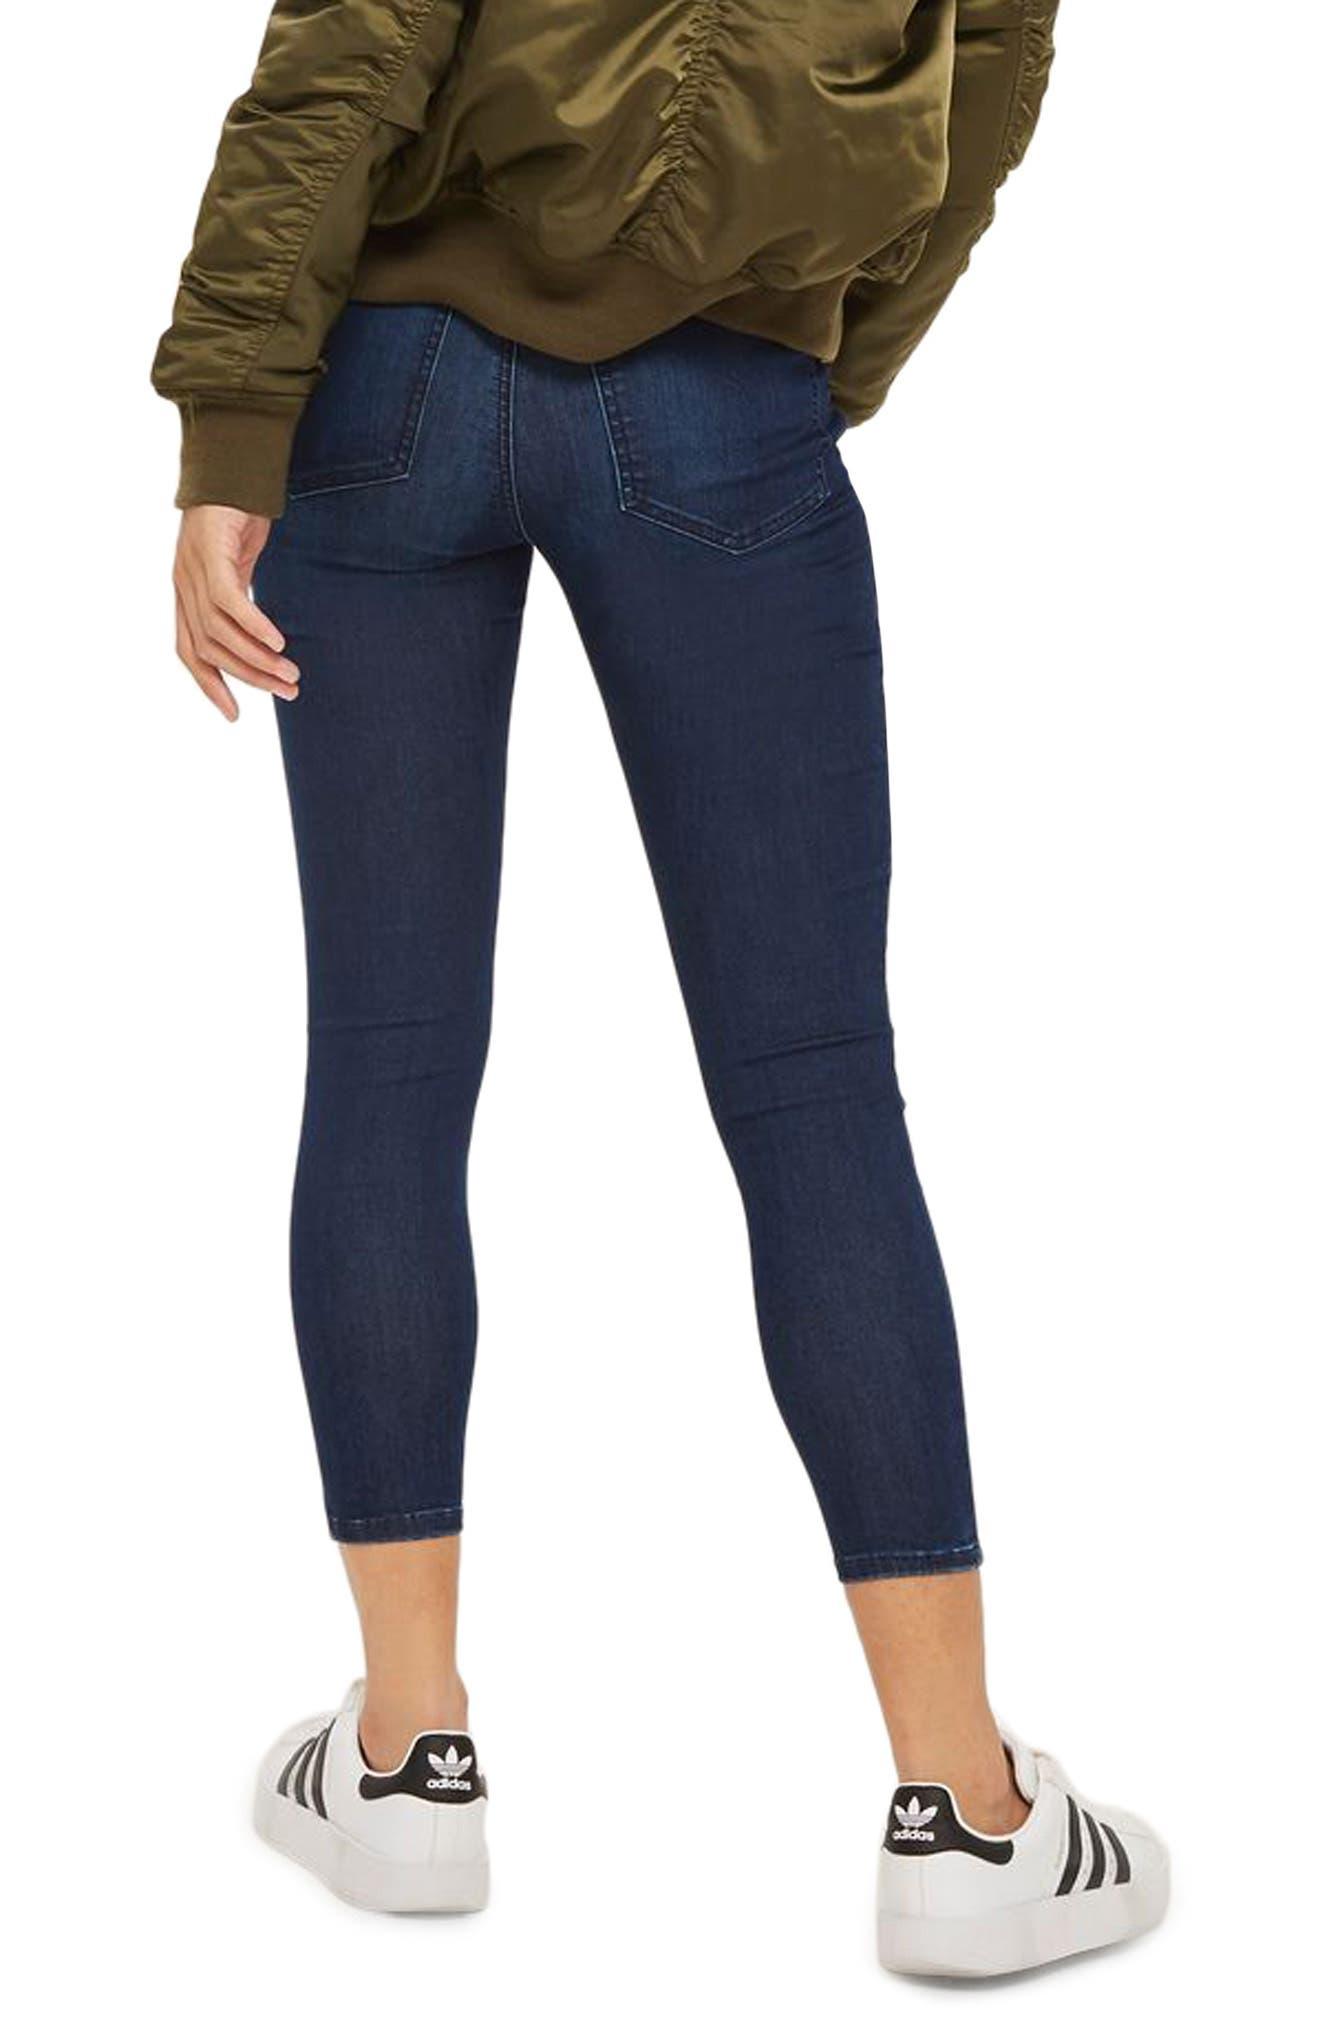 Alternate Image 2  - Topshop Joni High Waist Skinny Jeans (Petite)